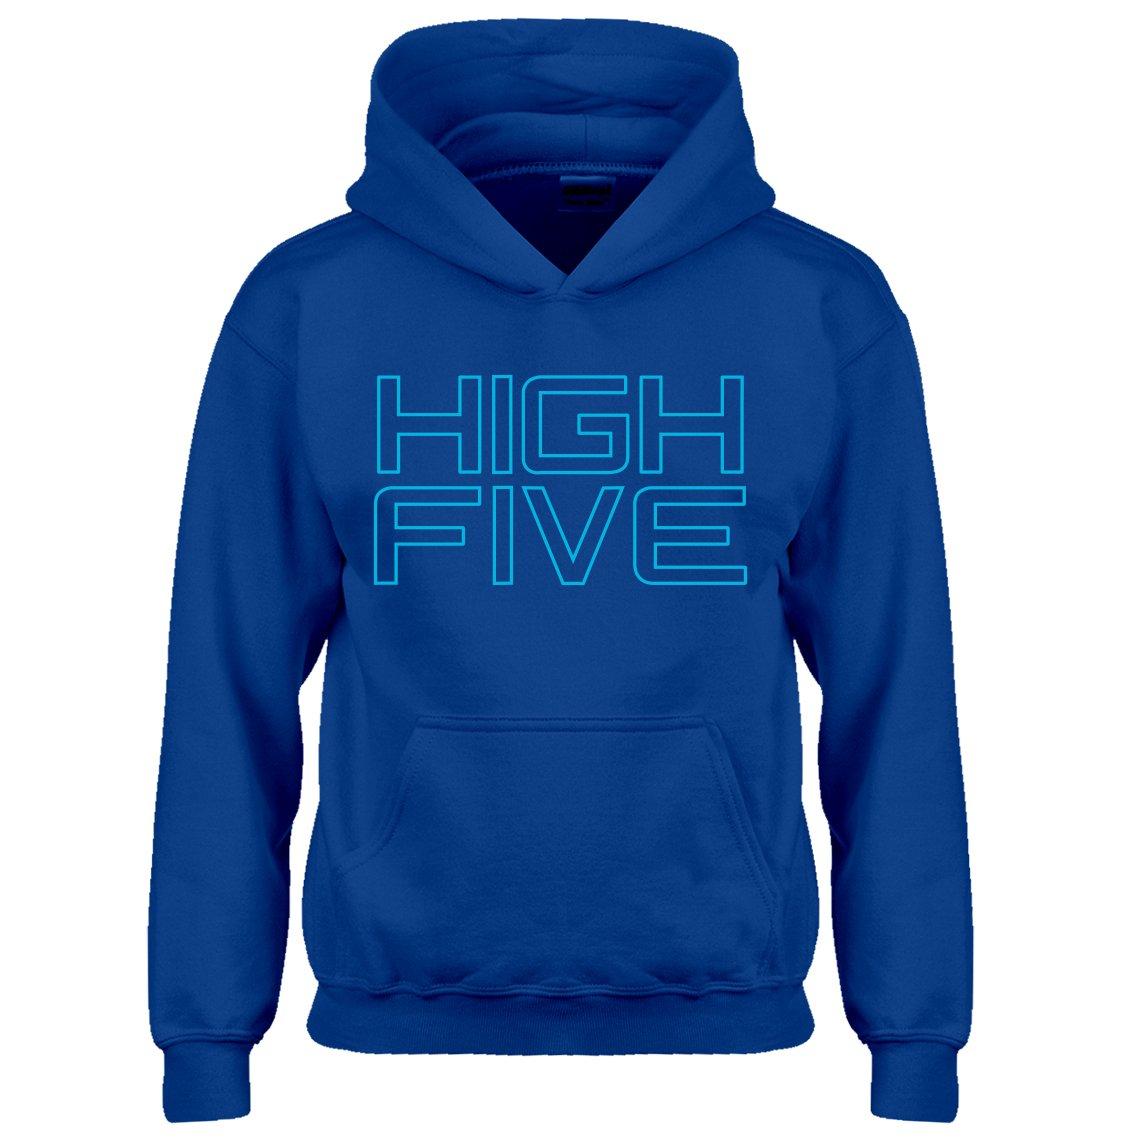 Indica Plateau Youth High Five Kids Hoodie